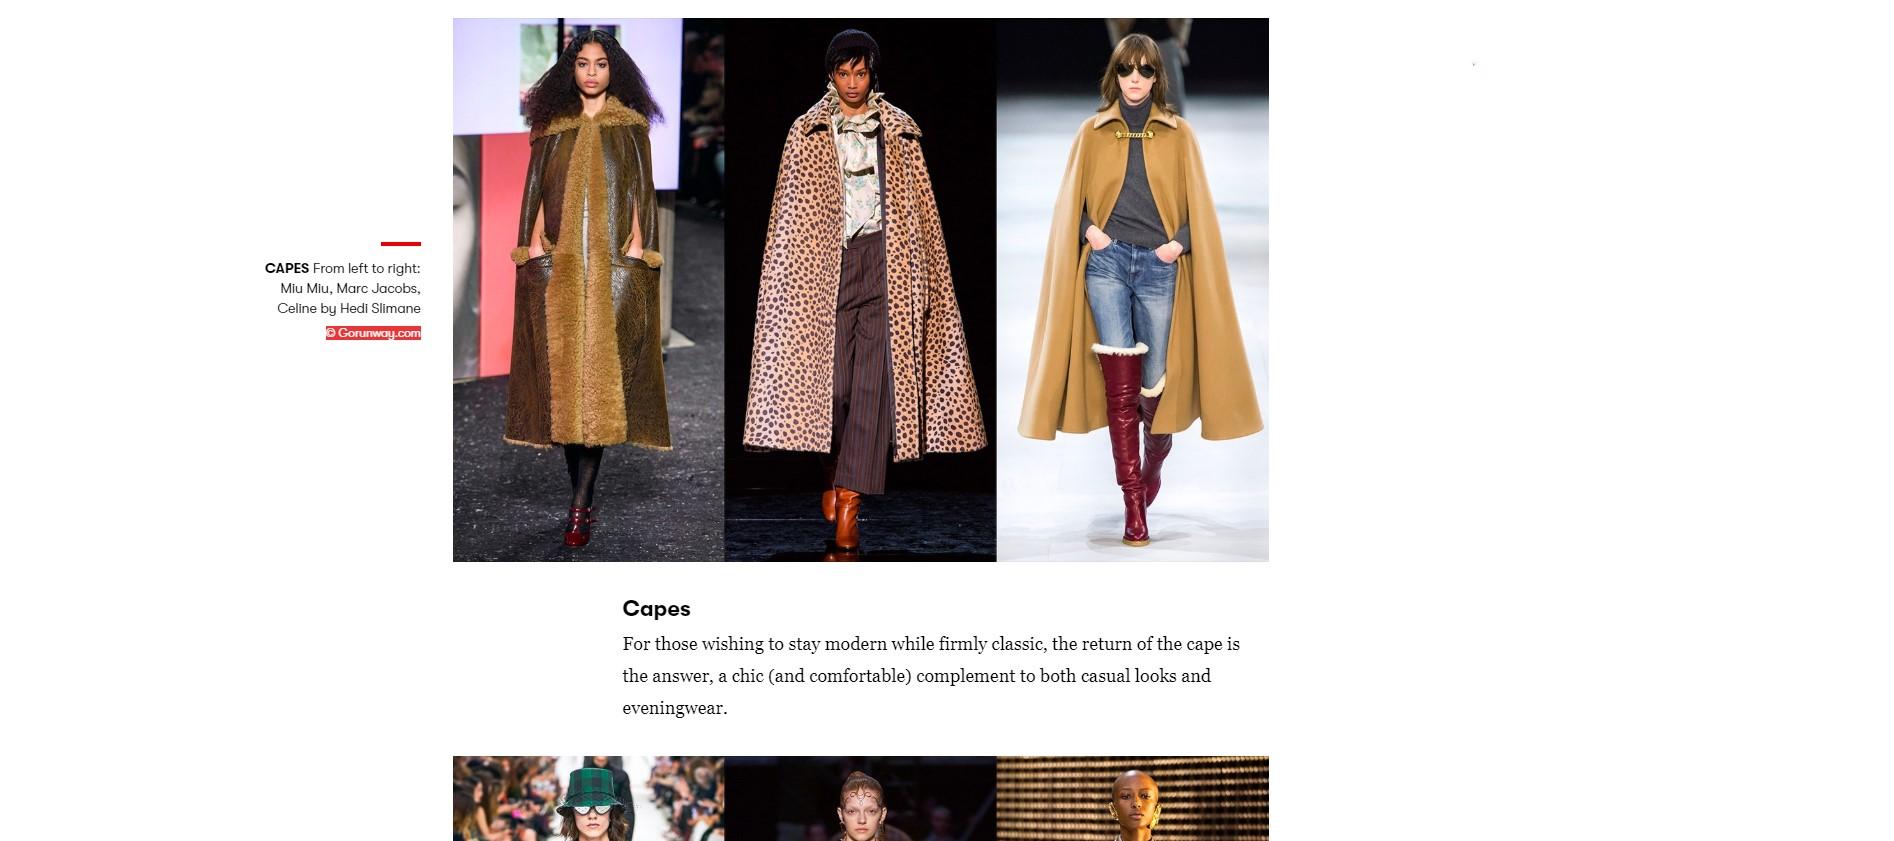 De comeback van de cape, fashiontrend F/W 2019-2020